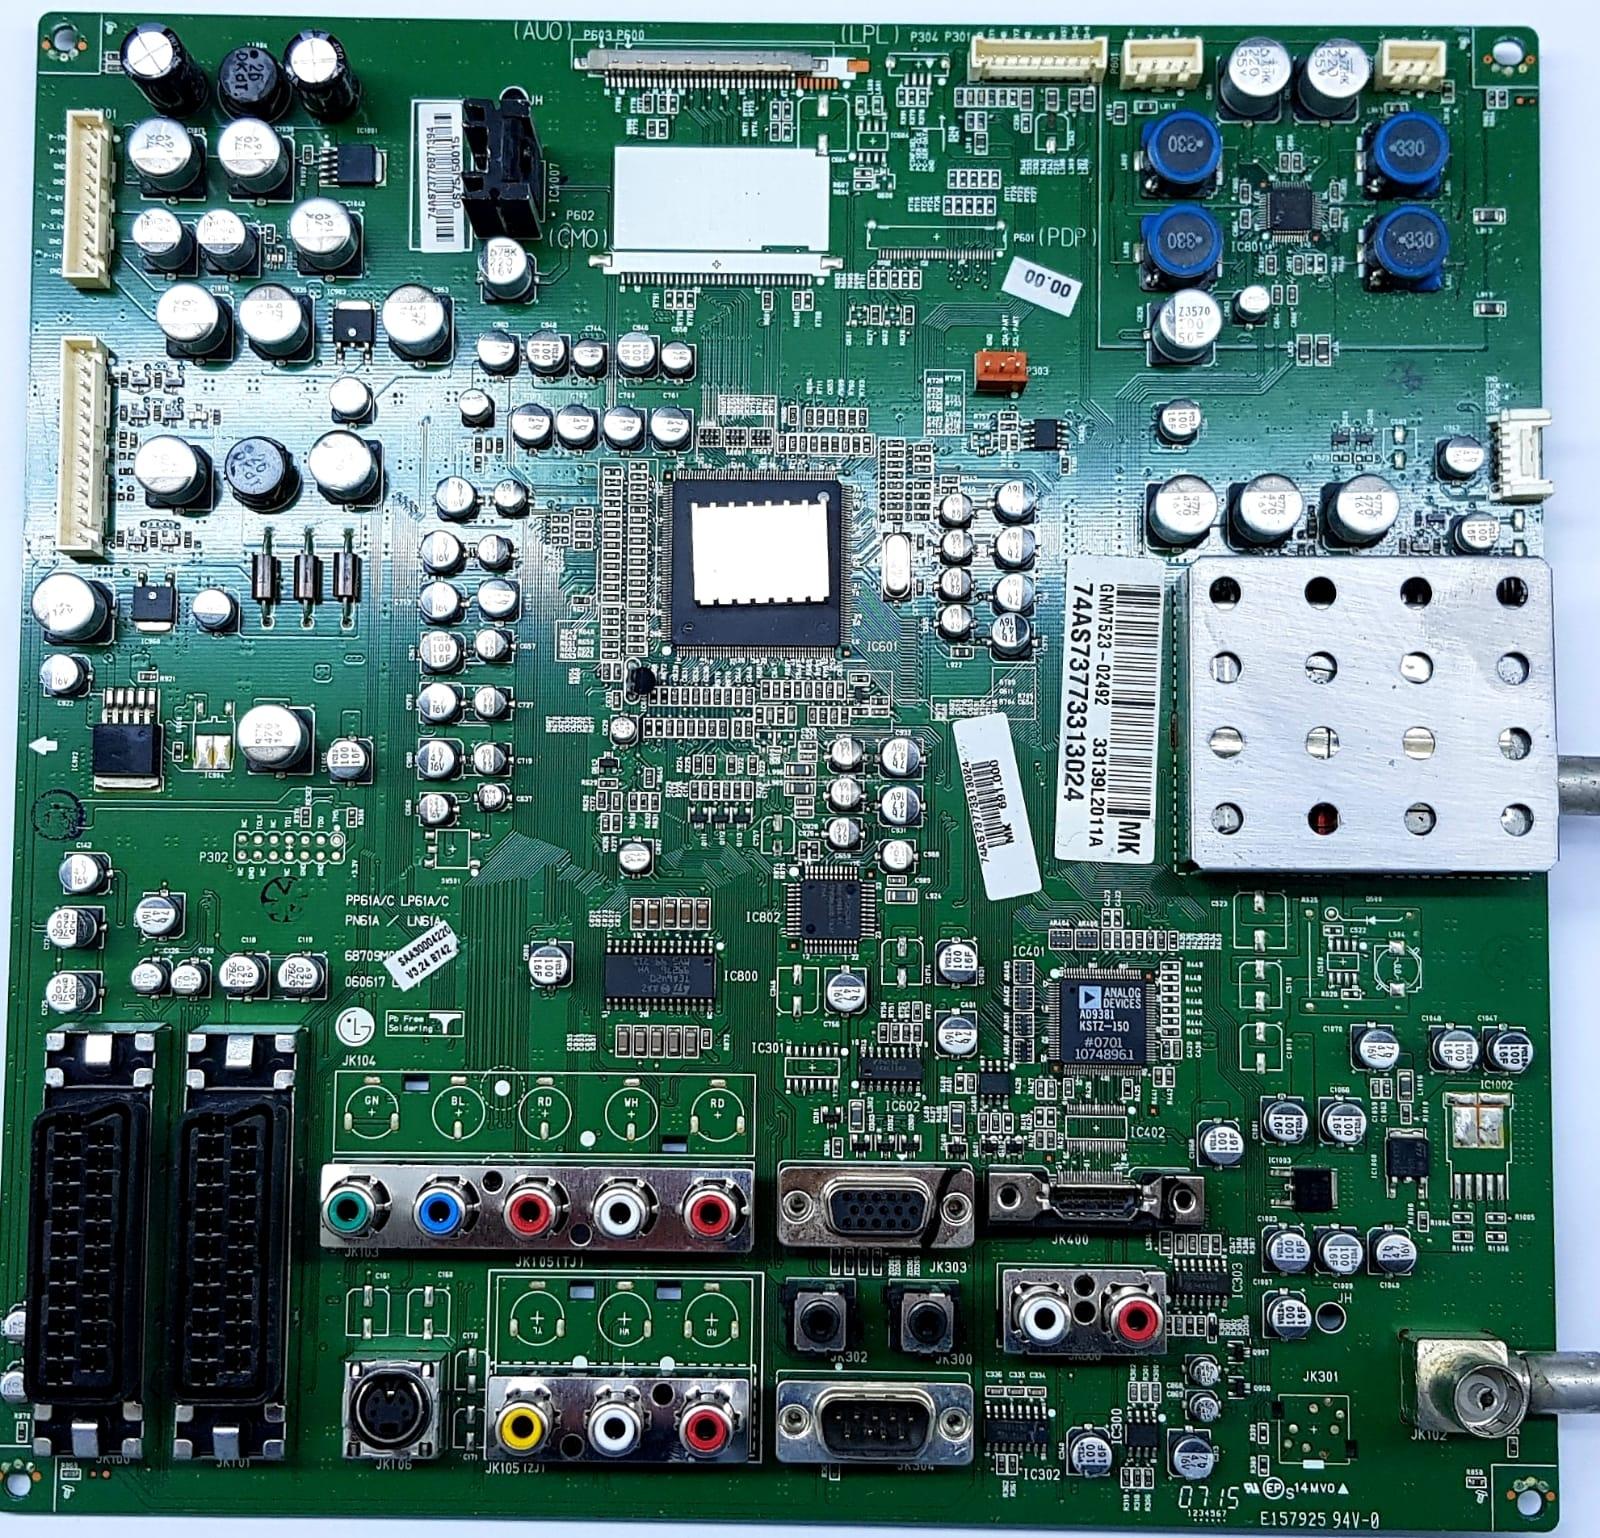 33139L2011 , A , GNM7523-02492 , LG , LG32LC2R , Main Board , Ana Kart